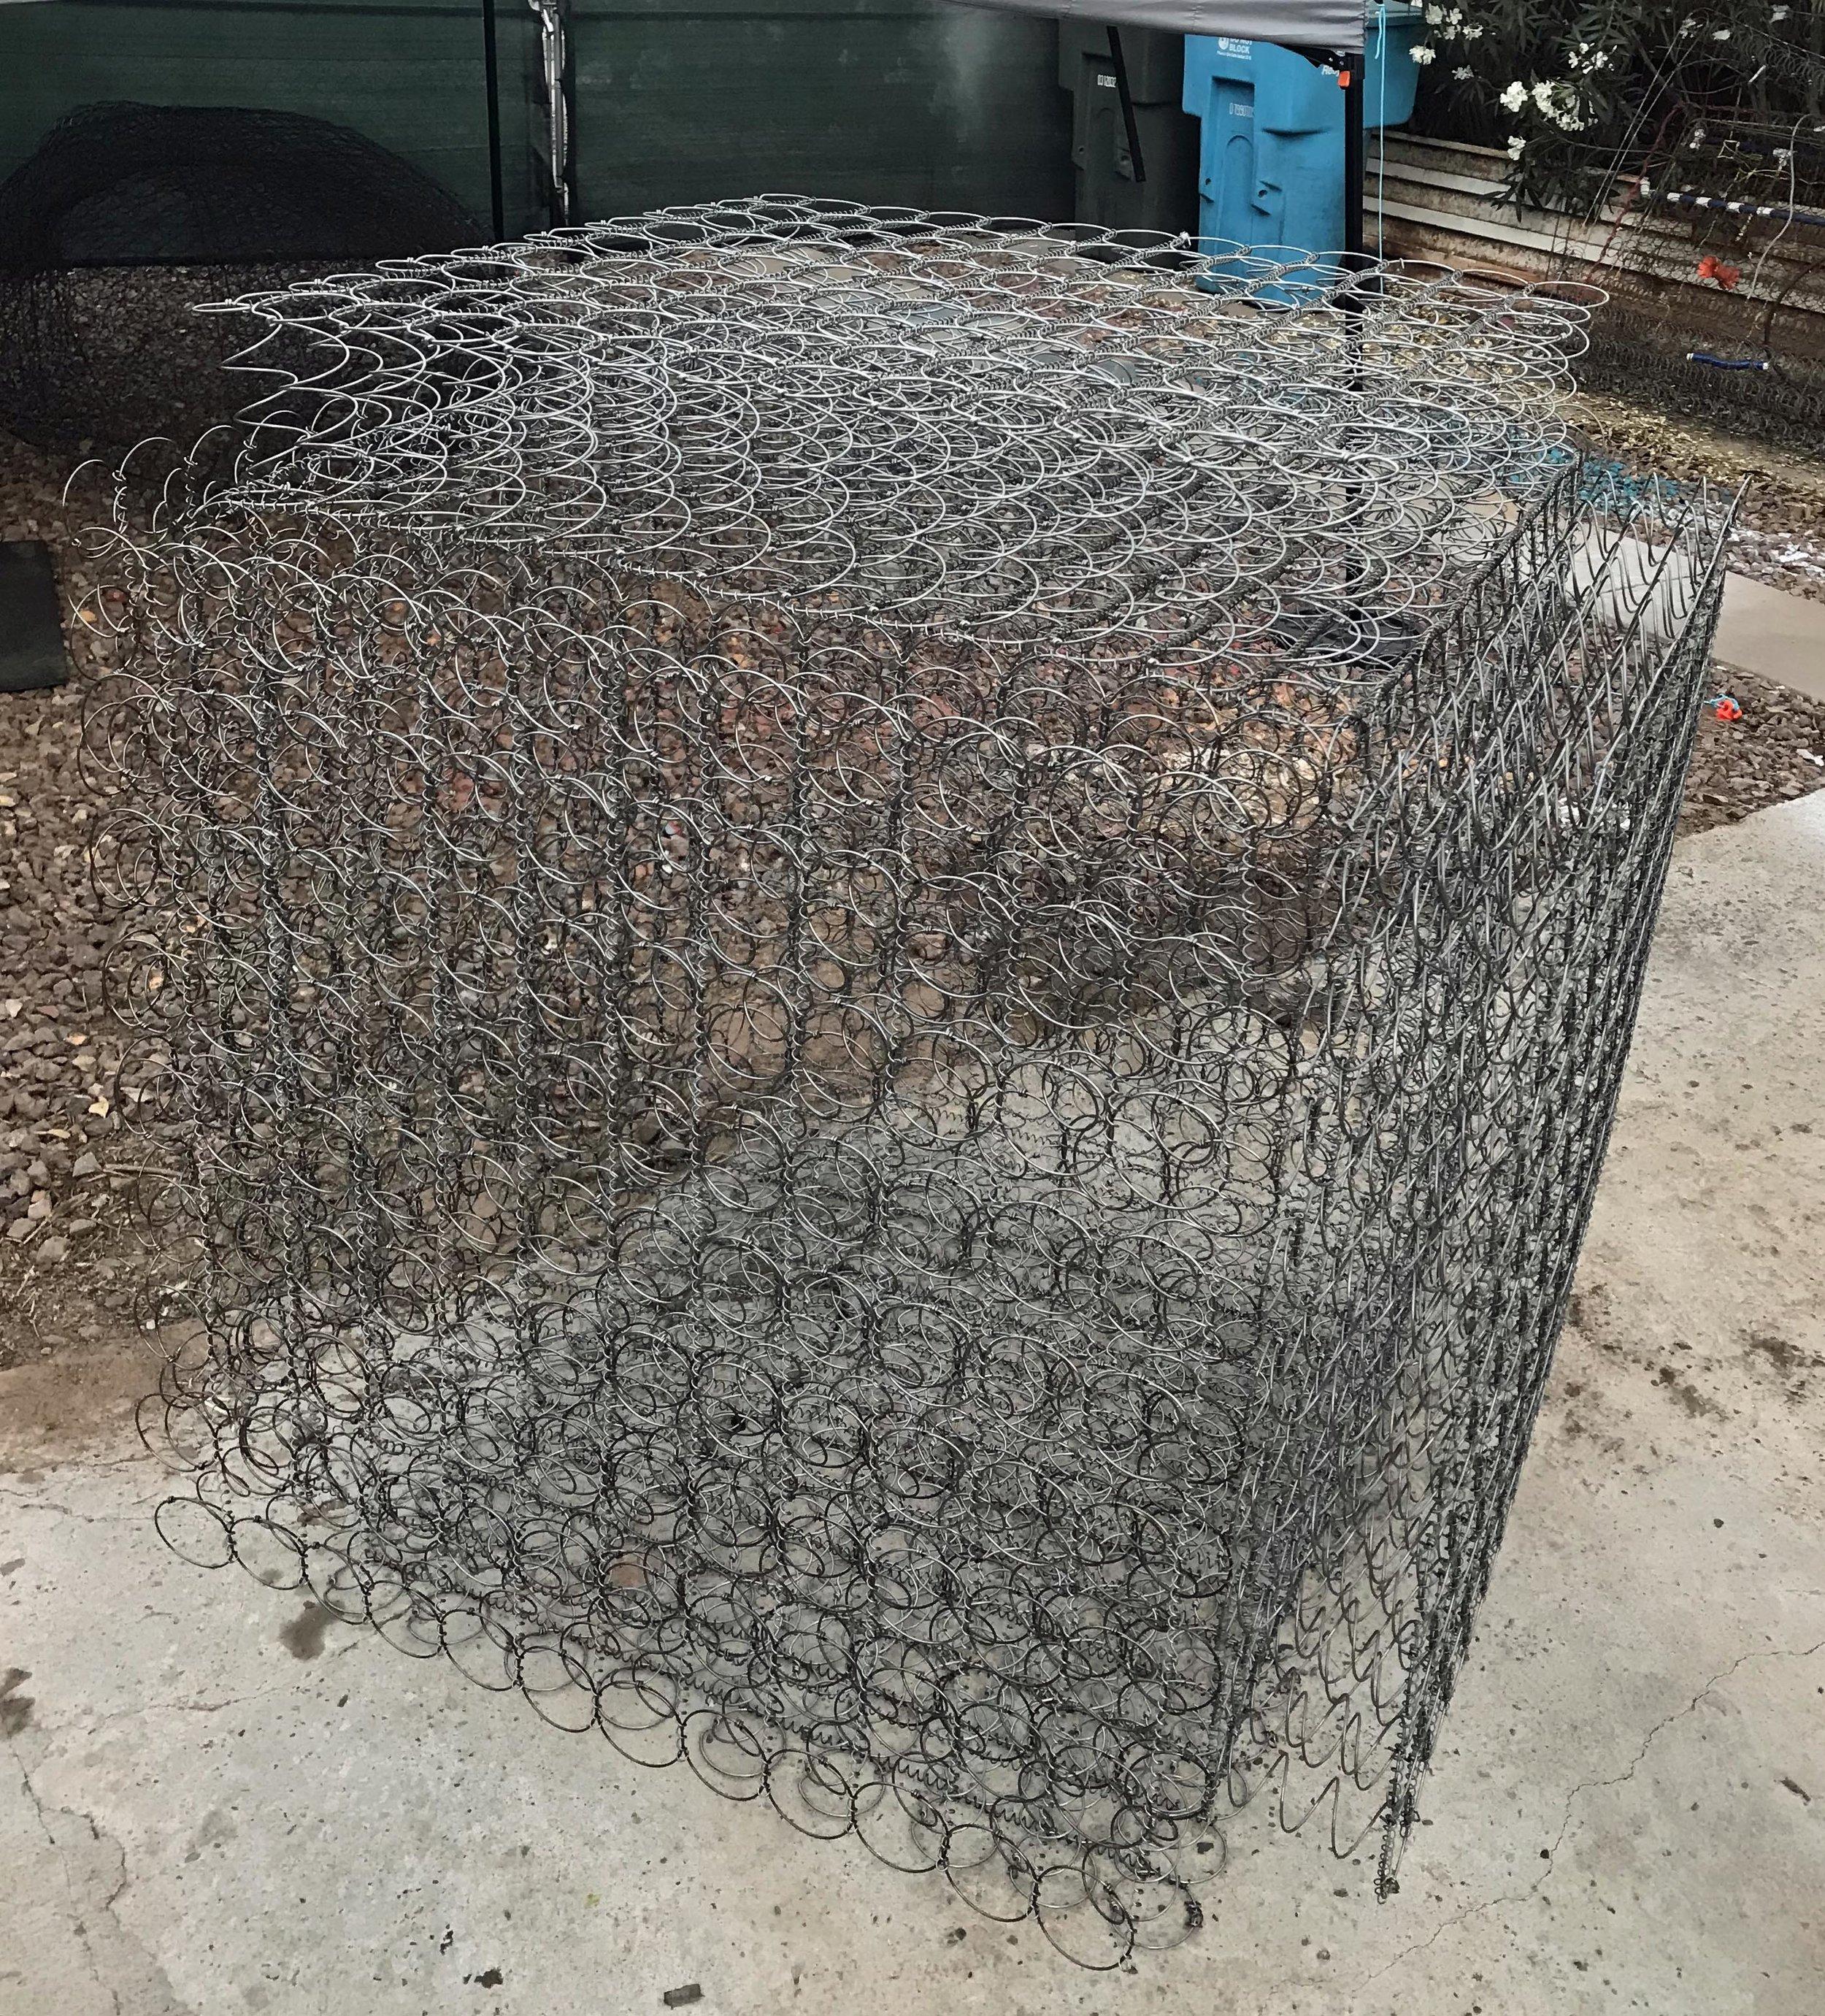 cube 518.jpg